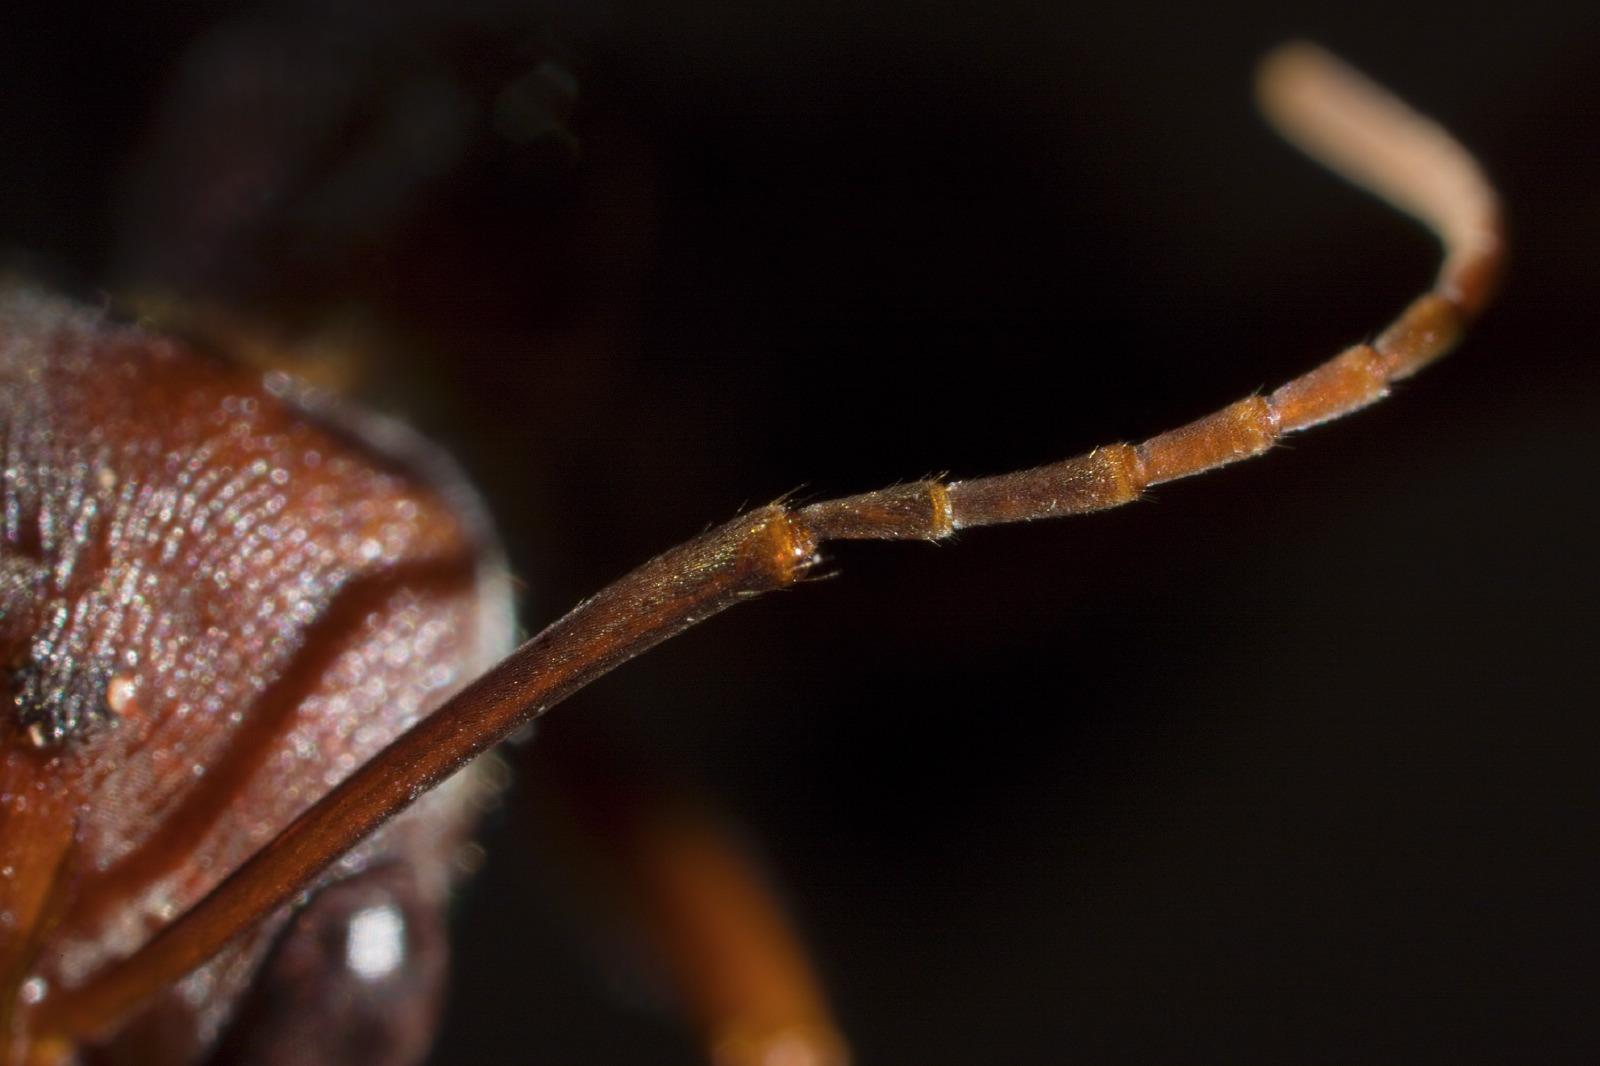 Myrmecia ant mosaic detail antenna